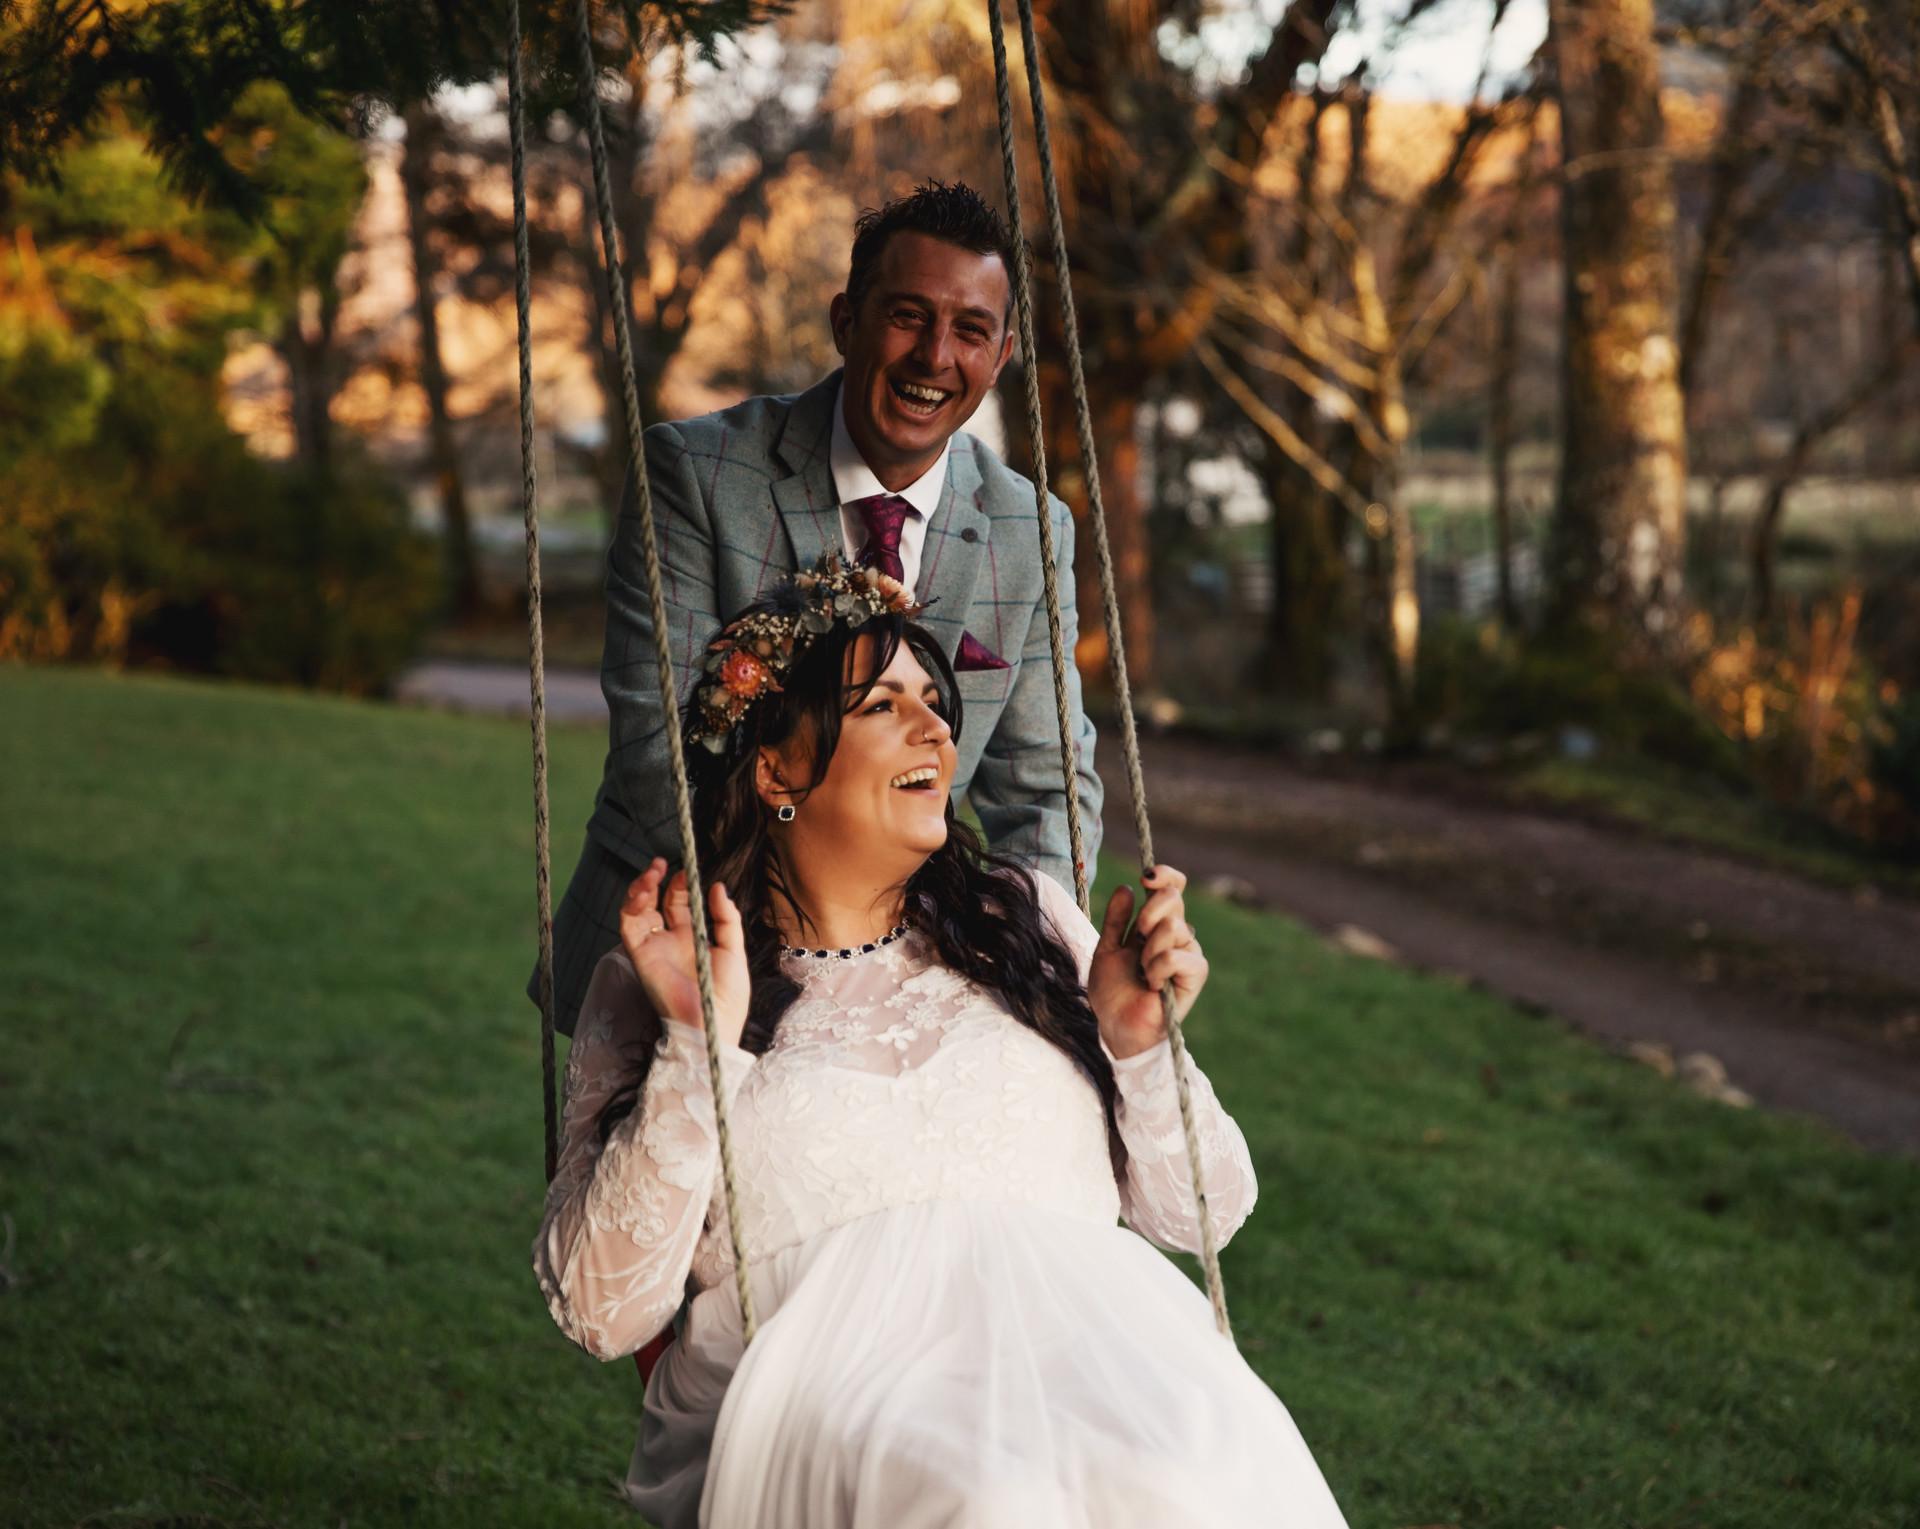 Katie & Richard's elopement in Scotland - Eilidh Cameron Photography